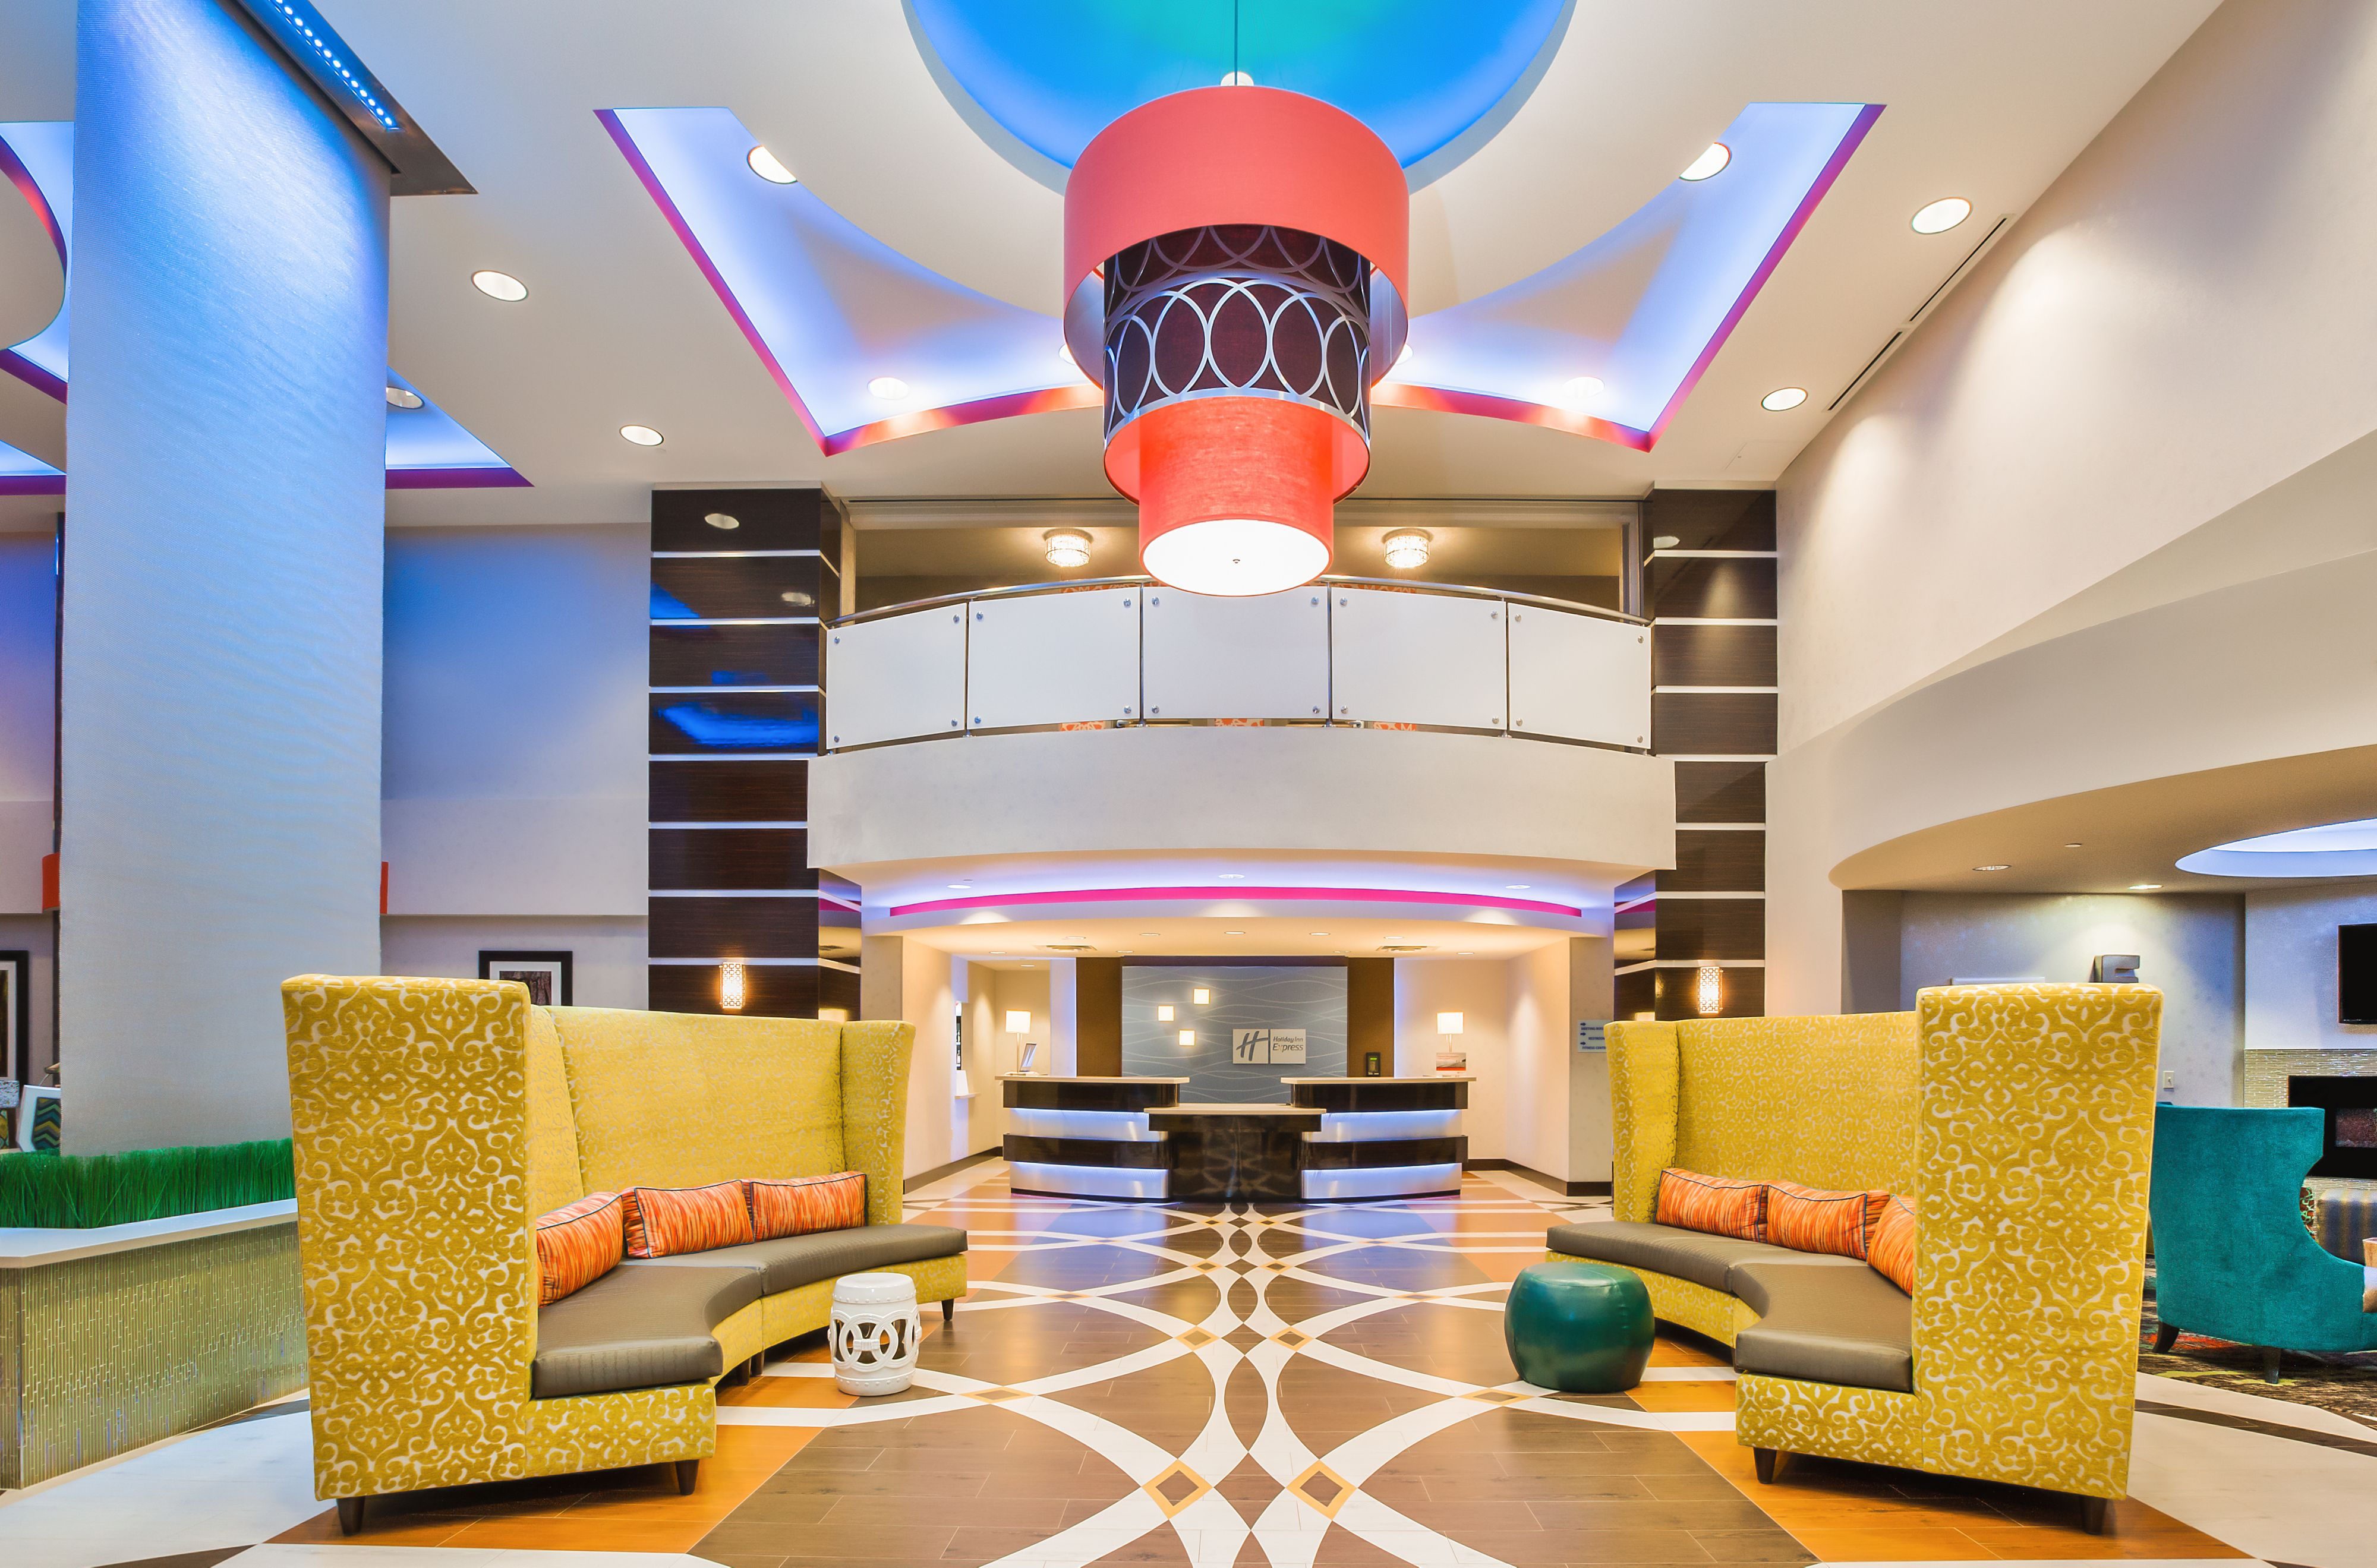 Holiday Inn Express & Suites Eureka image 4